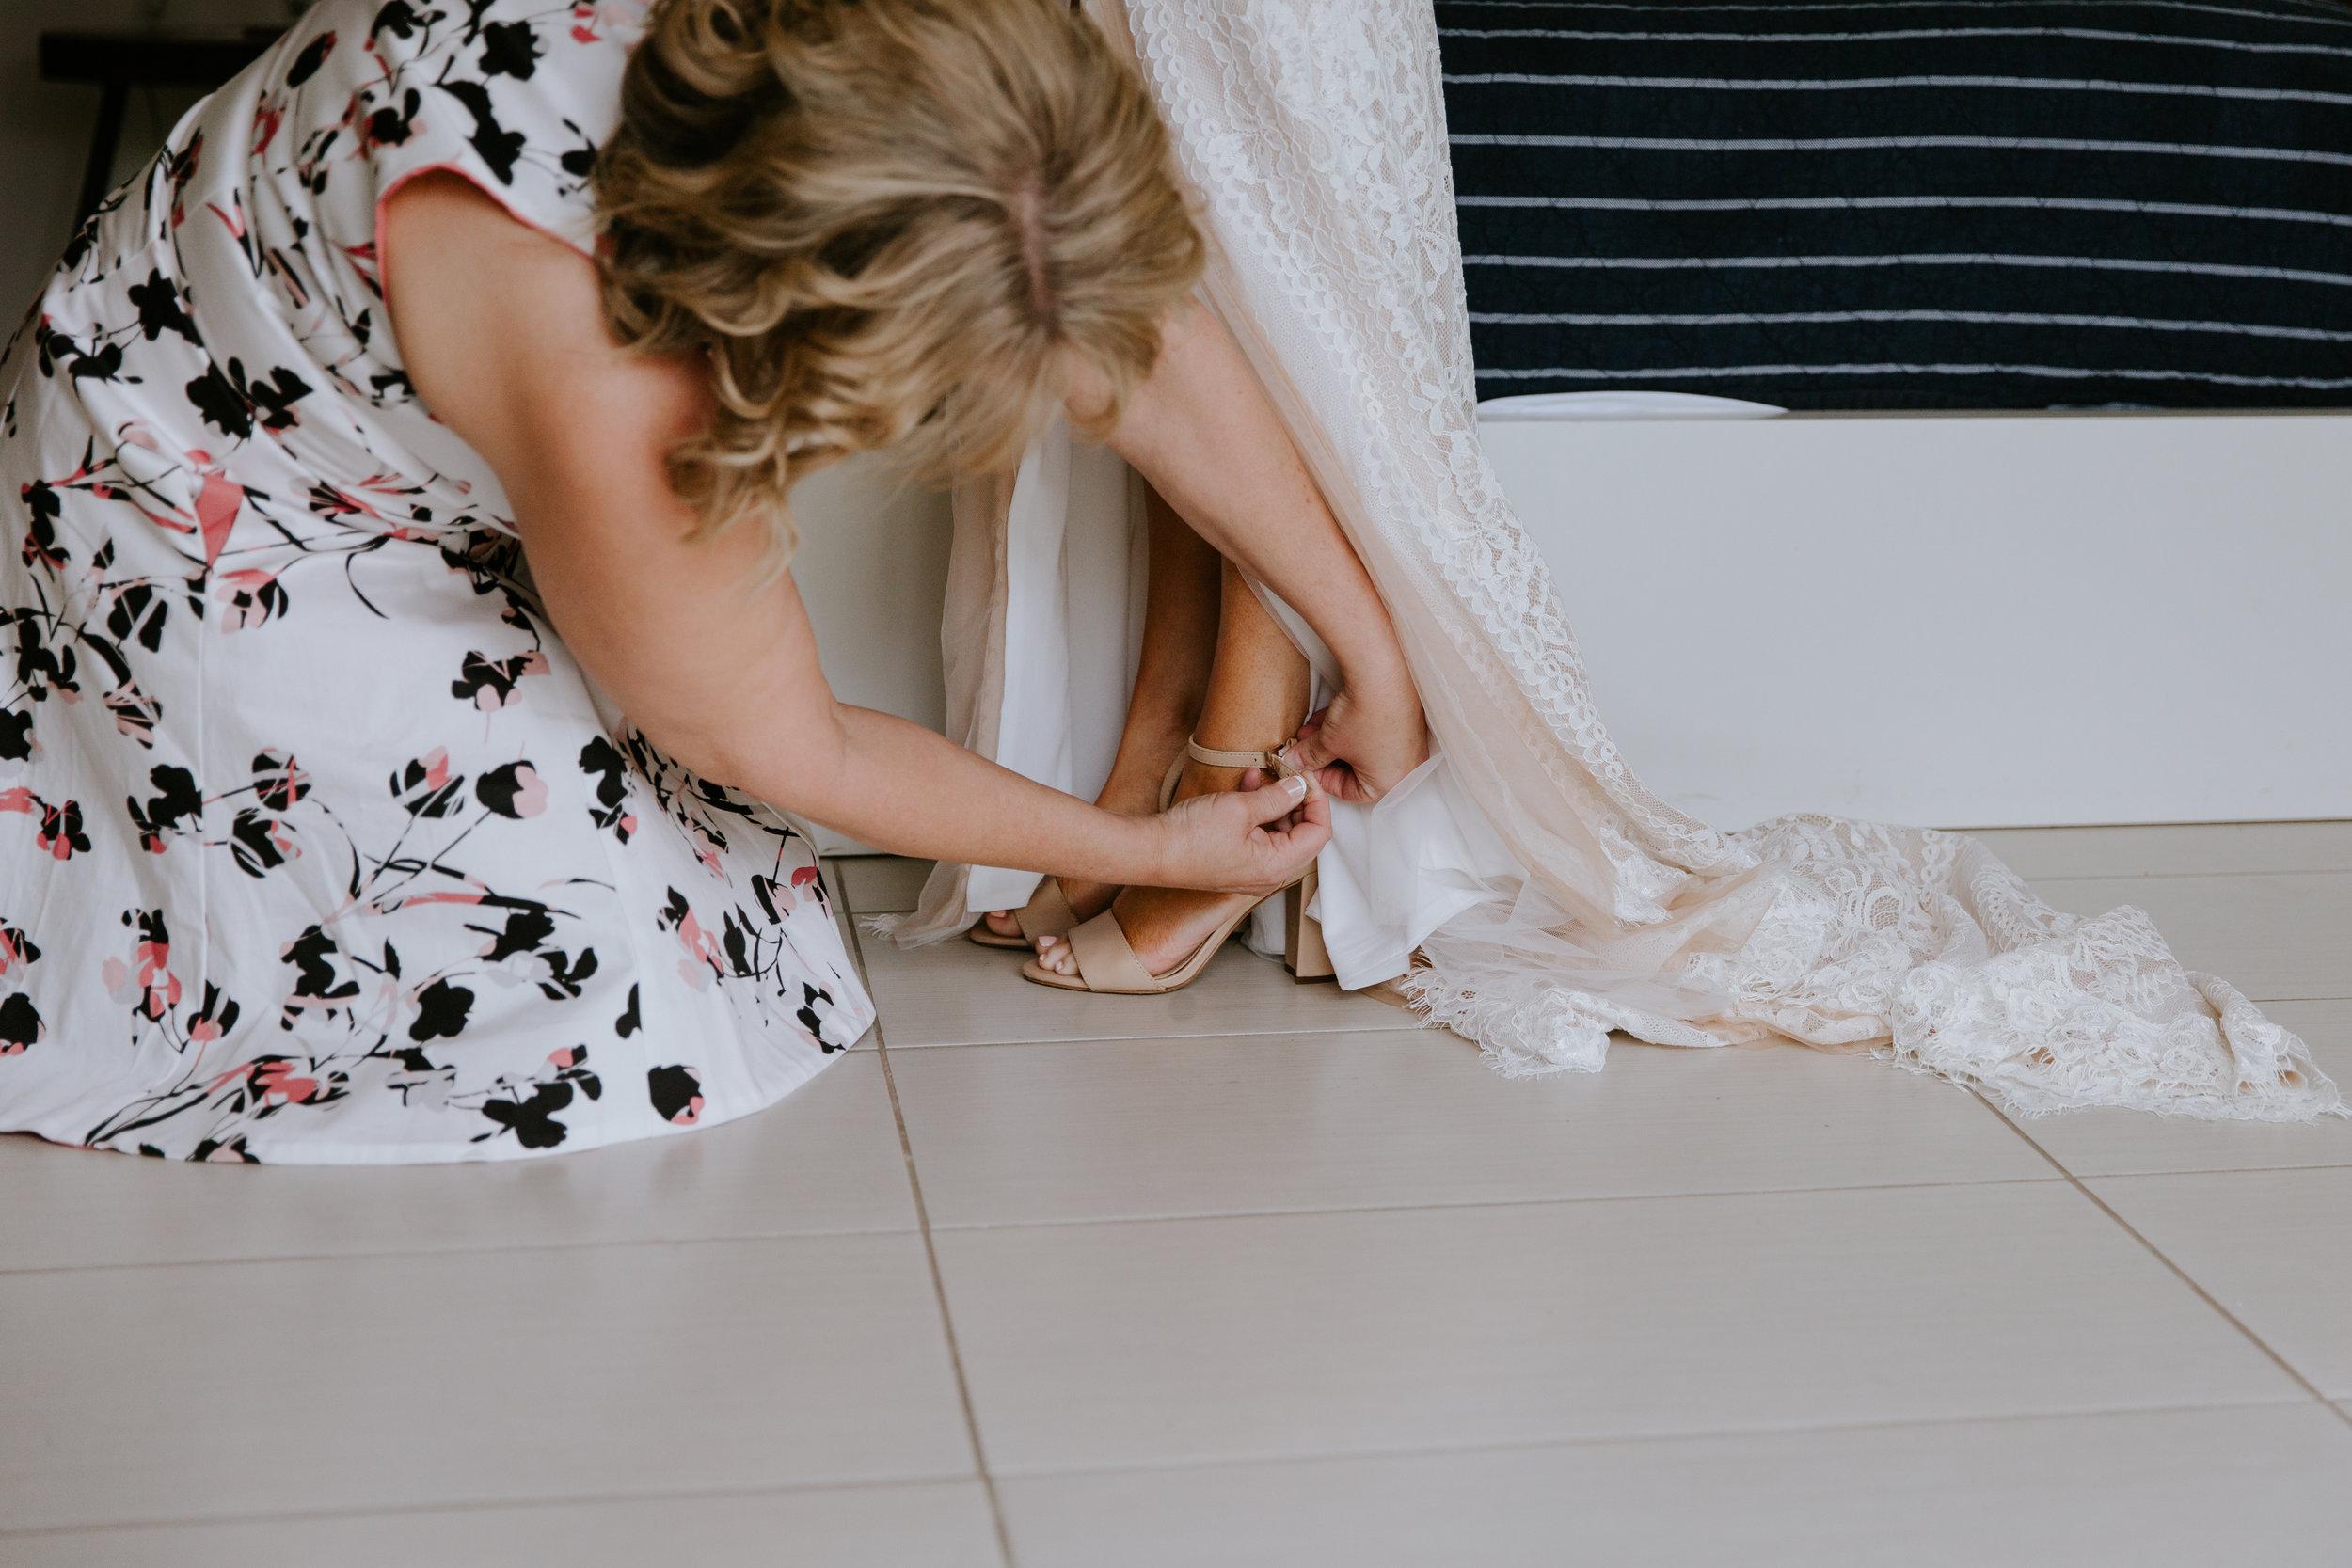 2019-05-26_Callie-Evan_Wedding_Joshua Tree_Paige Nelson_PREVIEWS HR-17.jpg